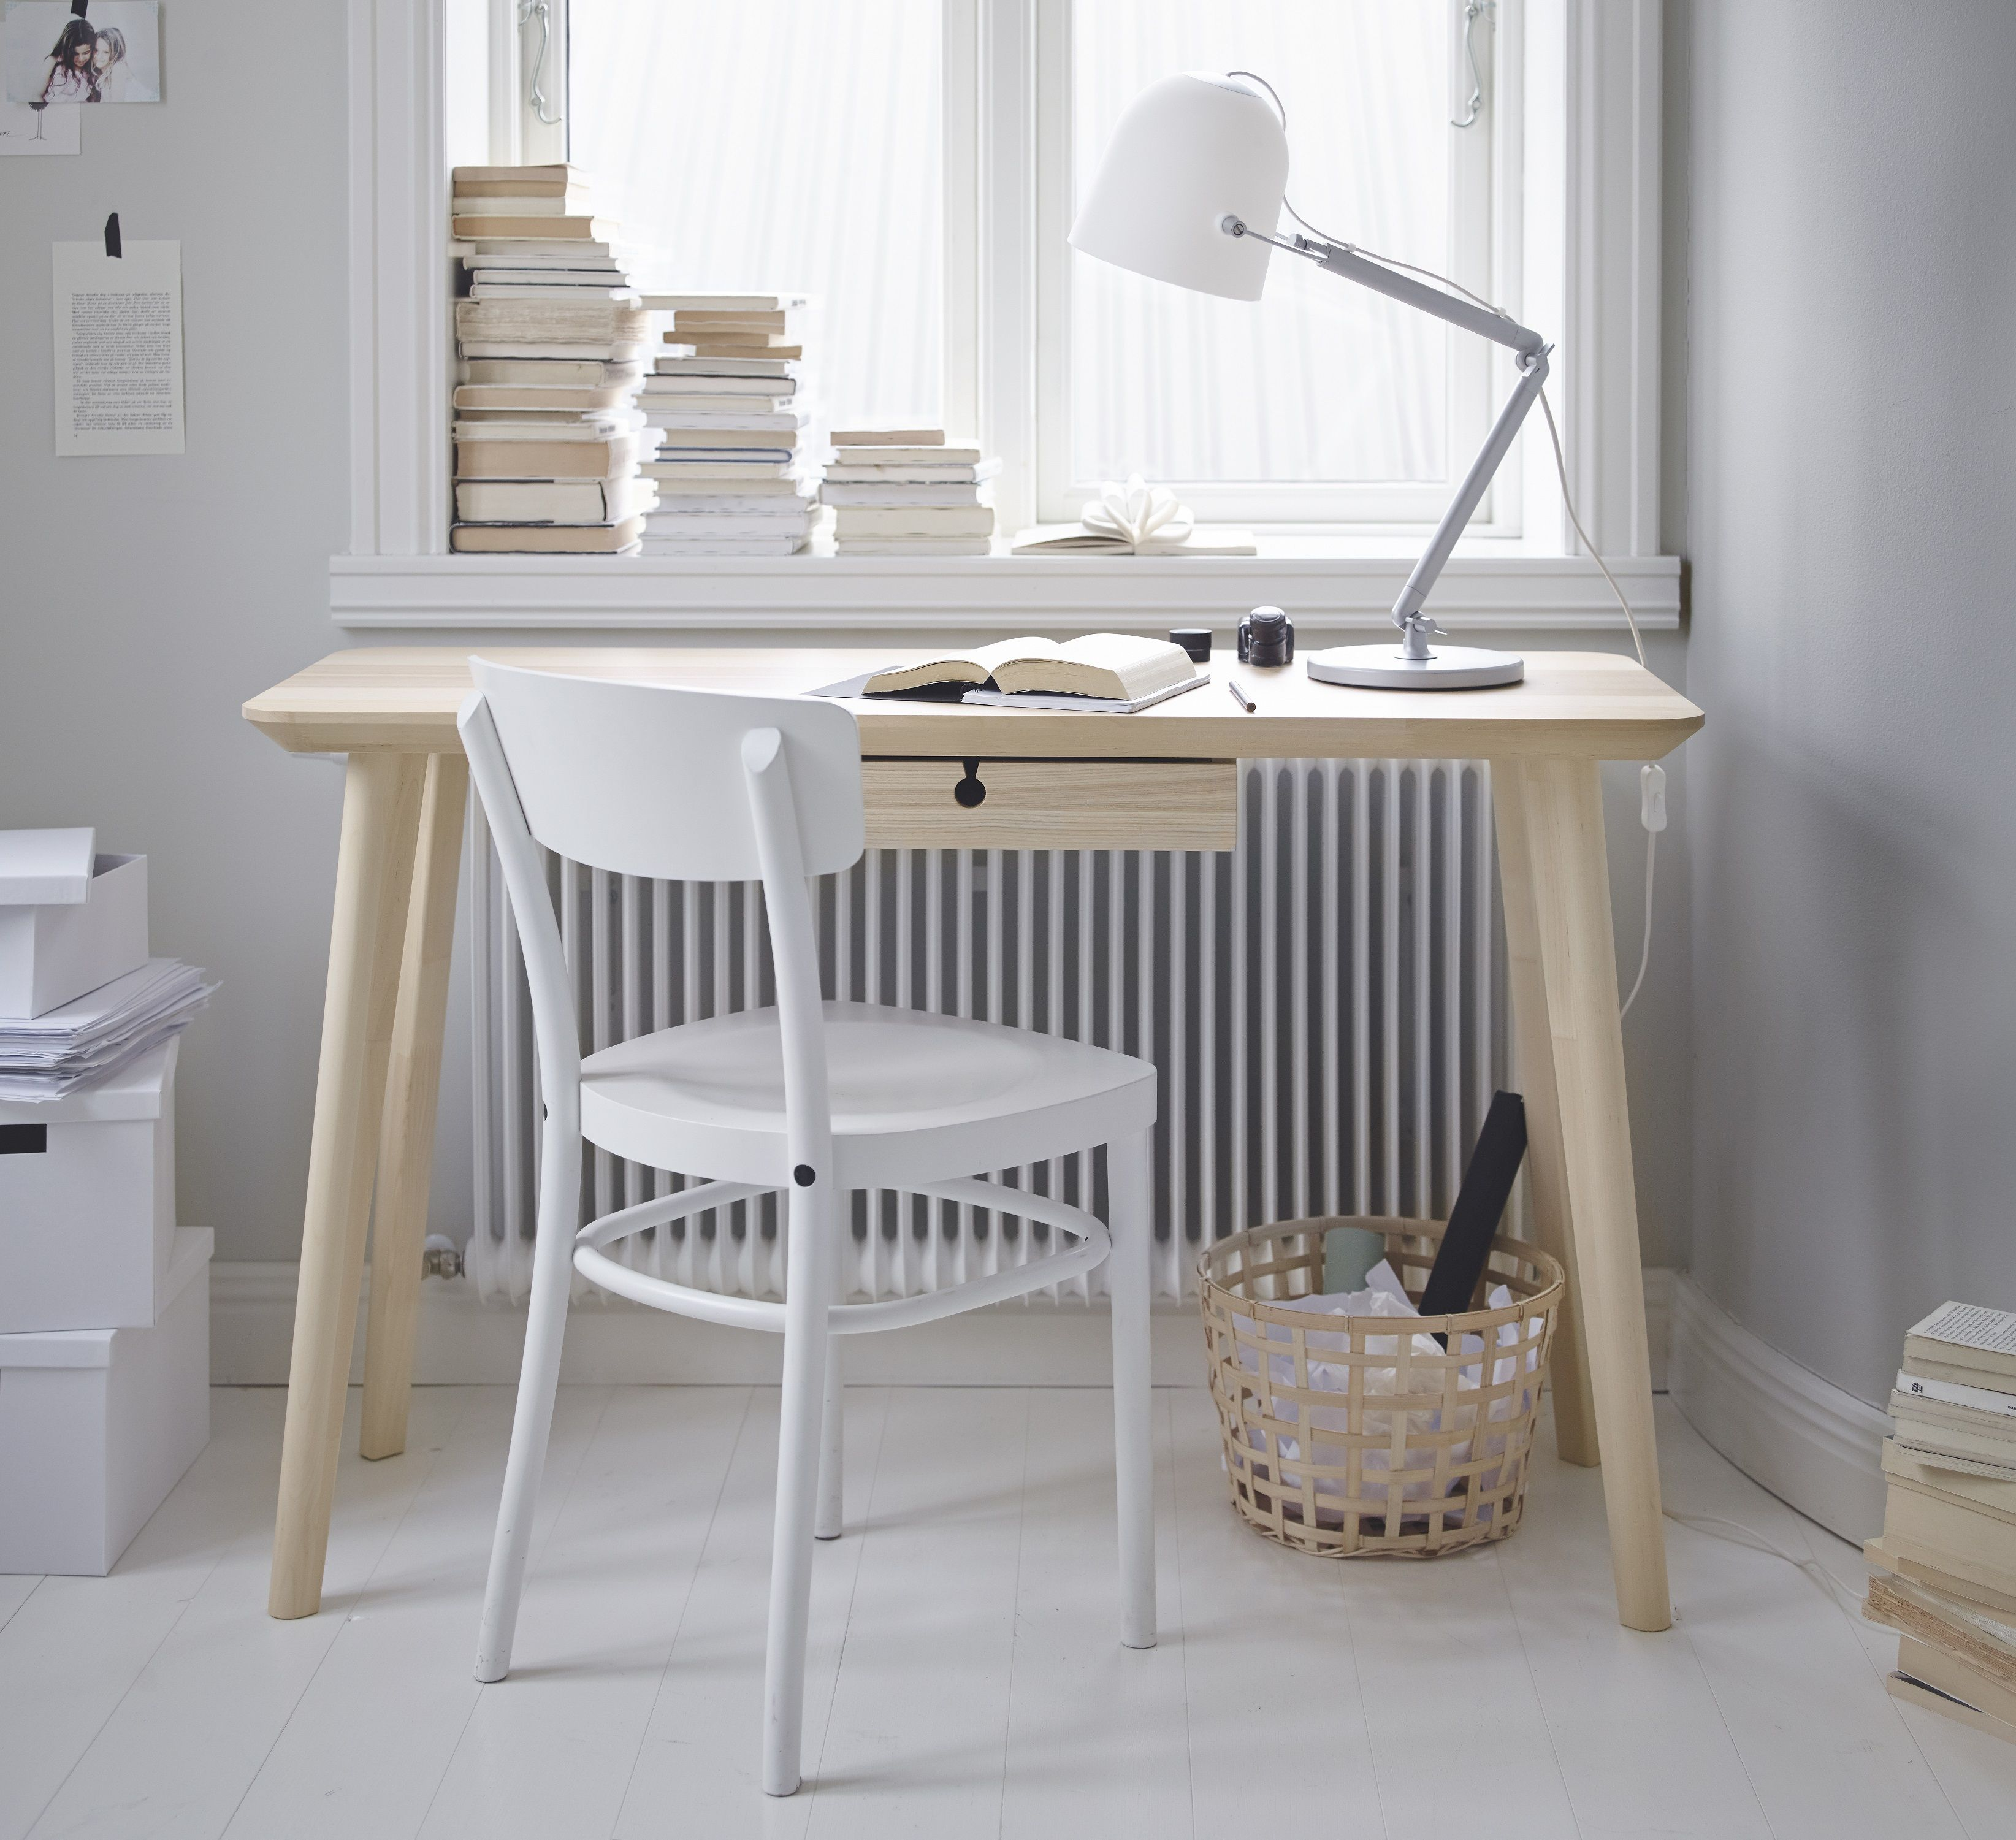 Lisabo Bureau Ikea Ikeanl Interieur Essenfineer Berken